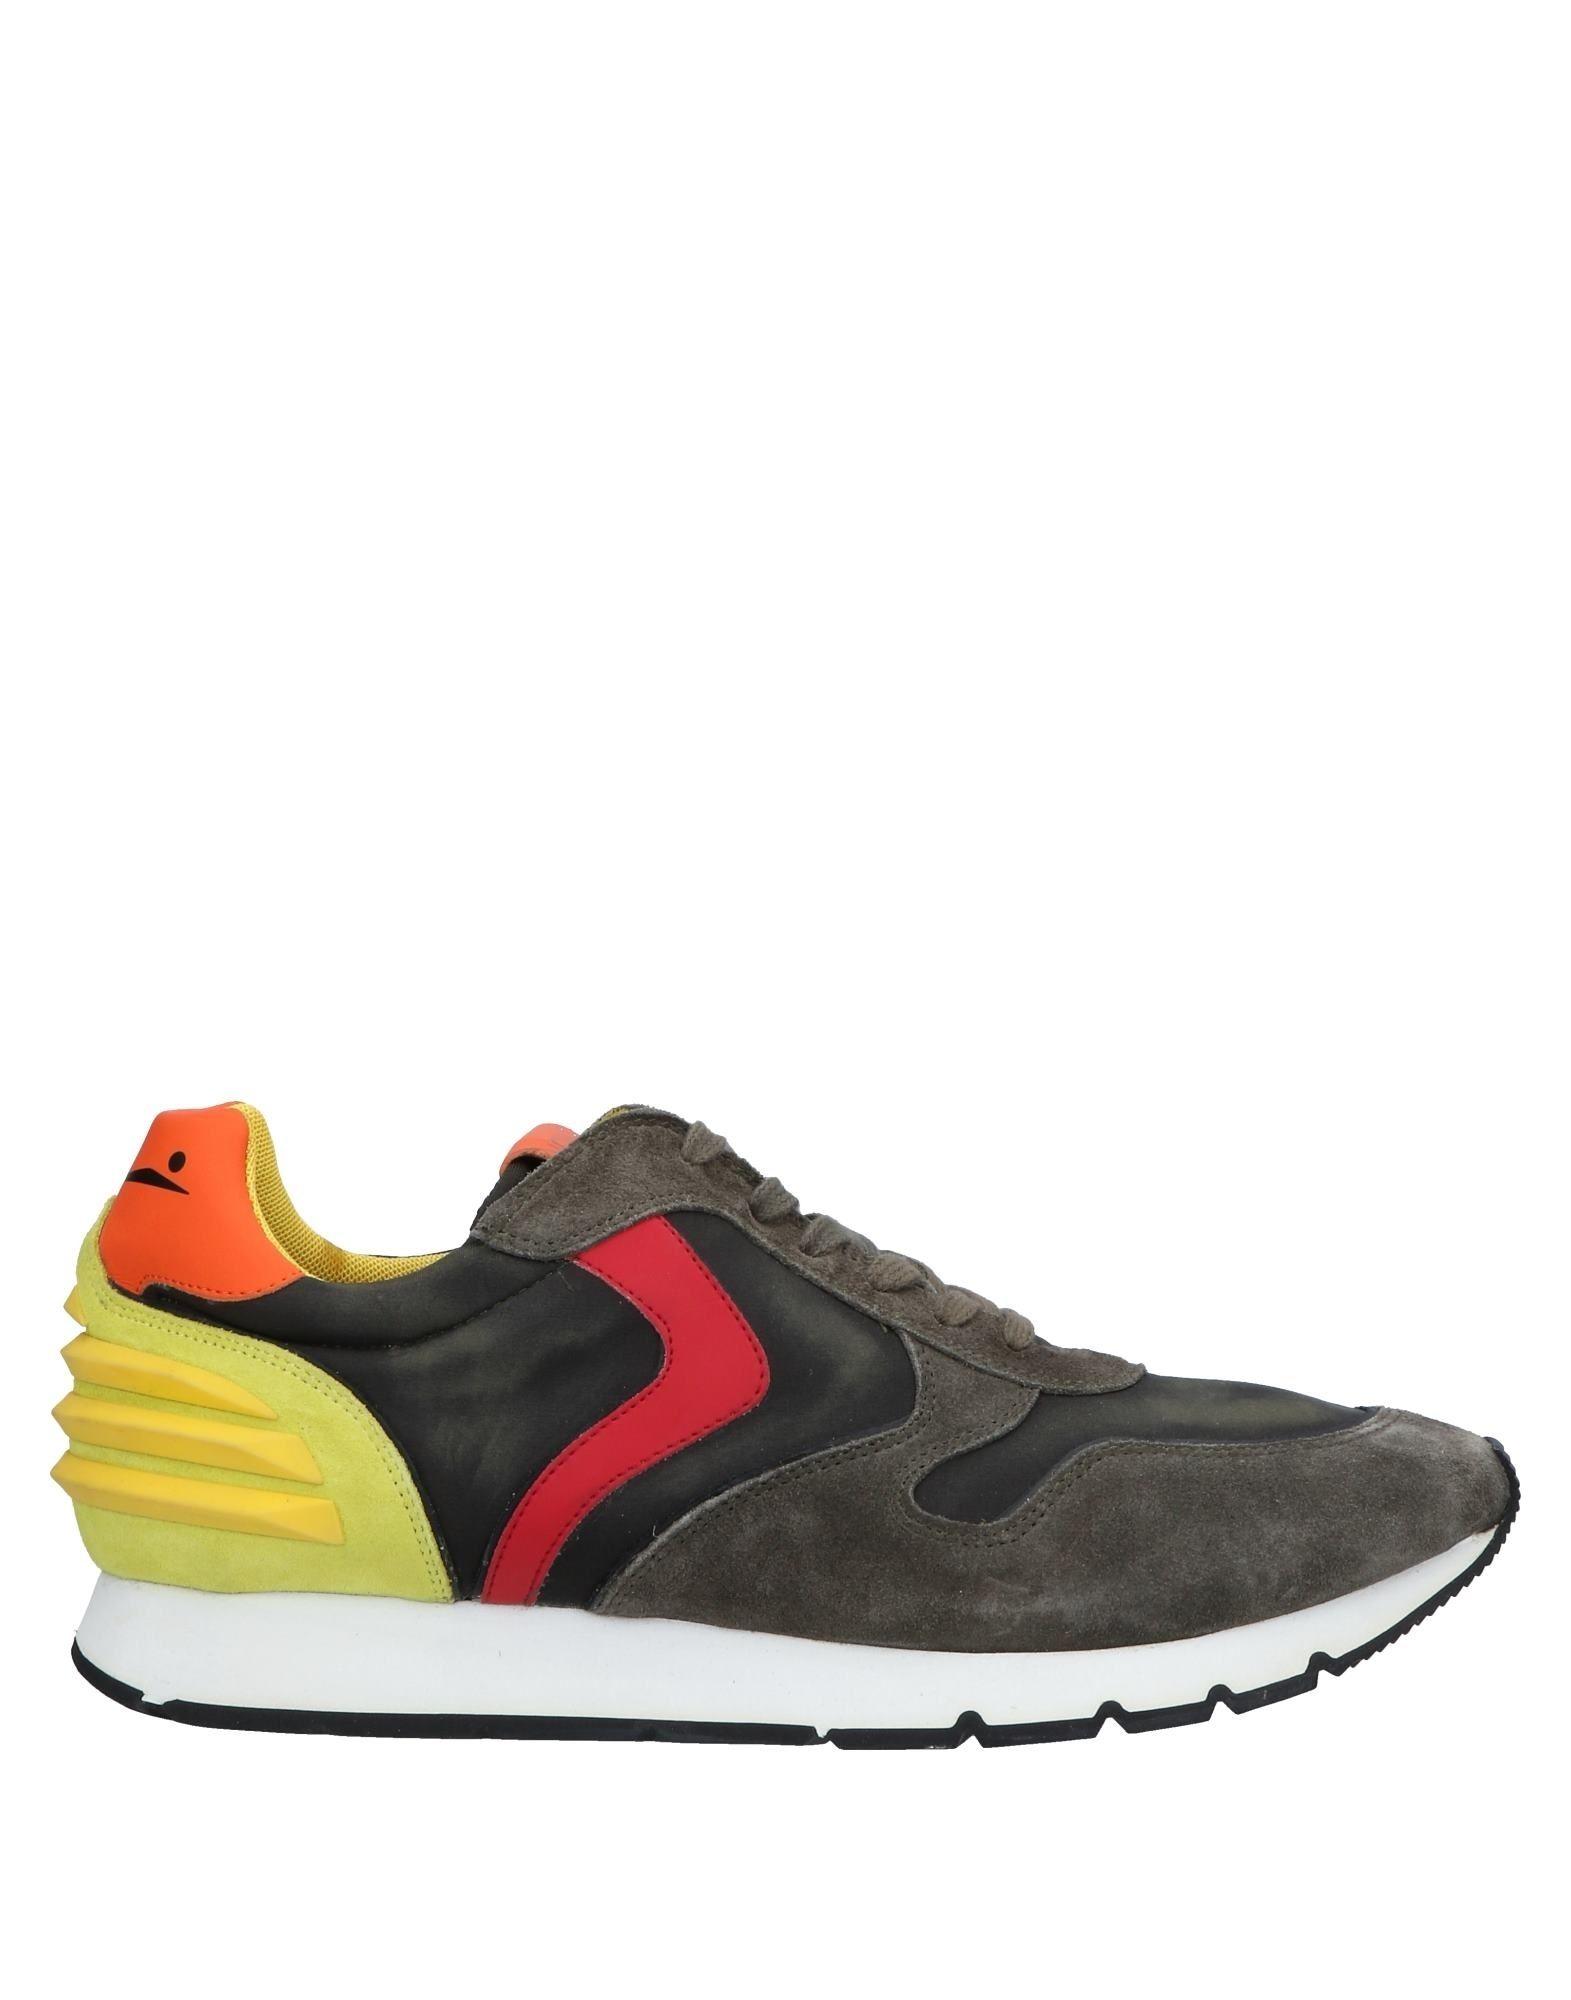 Sneakers Sneakers Sneakers Voile Blanche Homme - Sneakers Voile Blanche  Vert foncé Meilleur modèle de vente aa8ac6